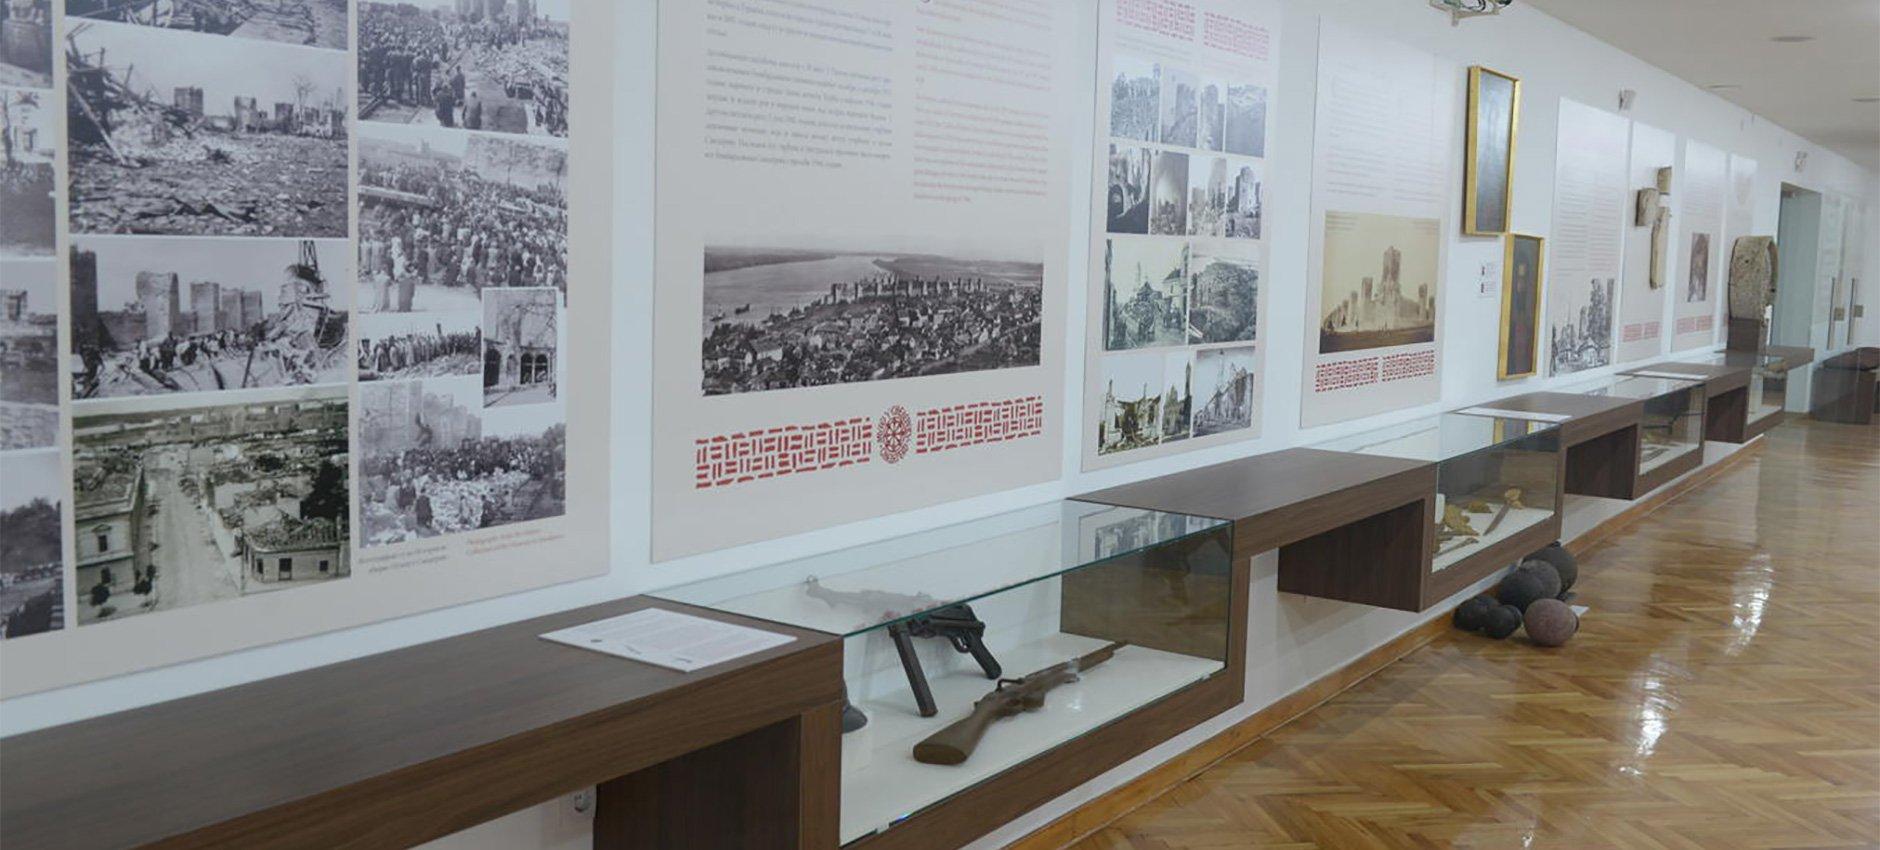 smederevo-muzej-23.jpg